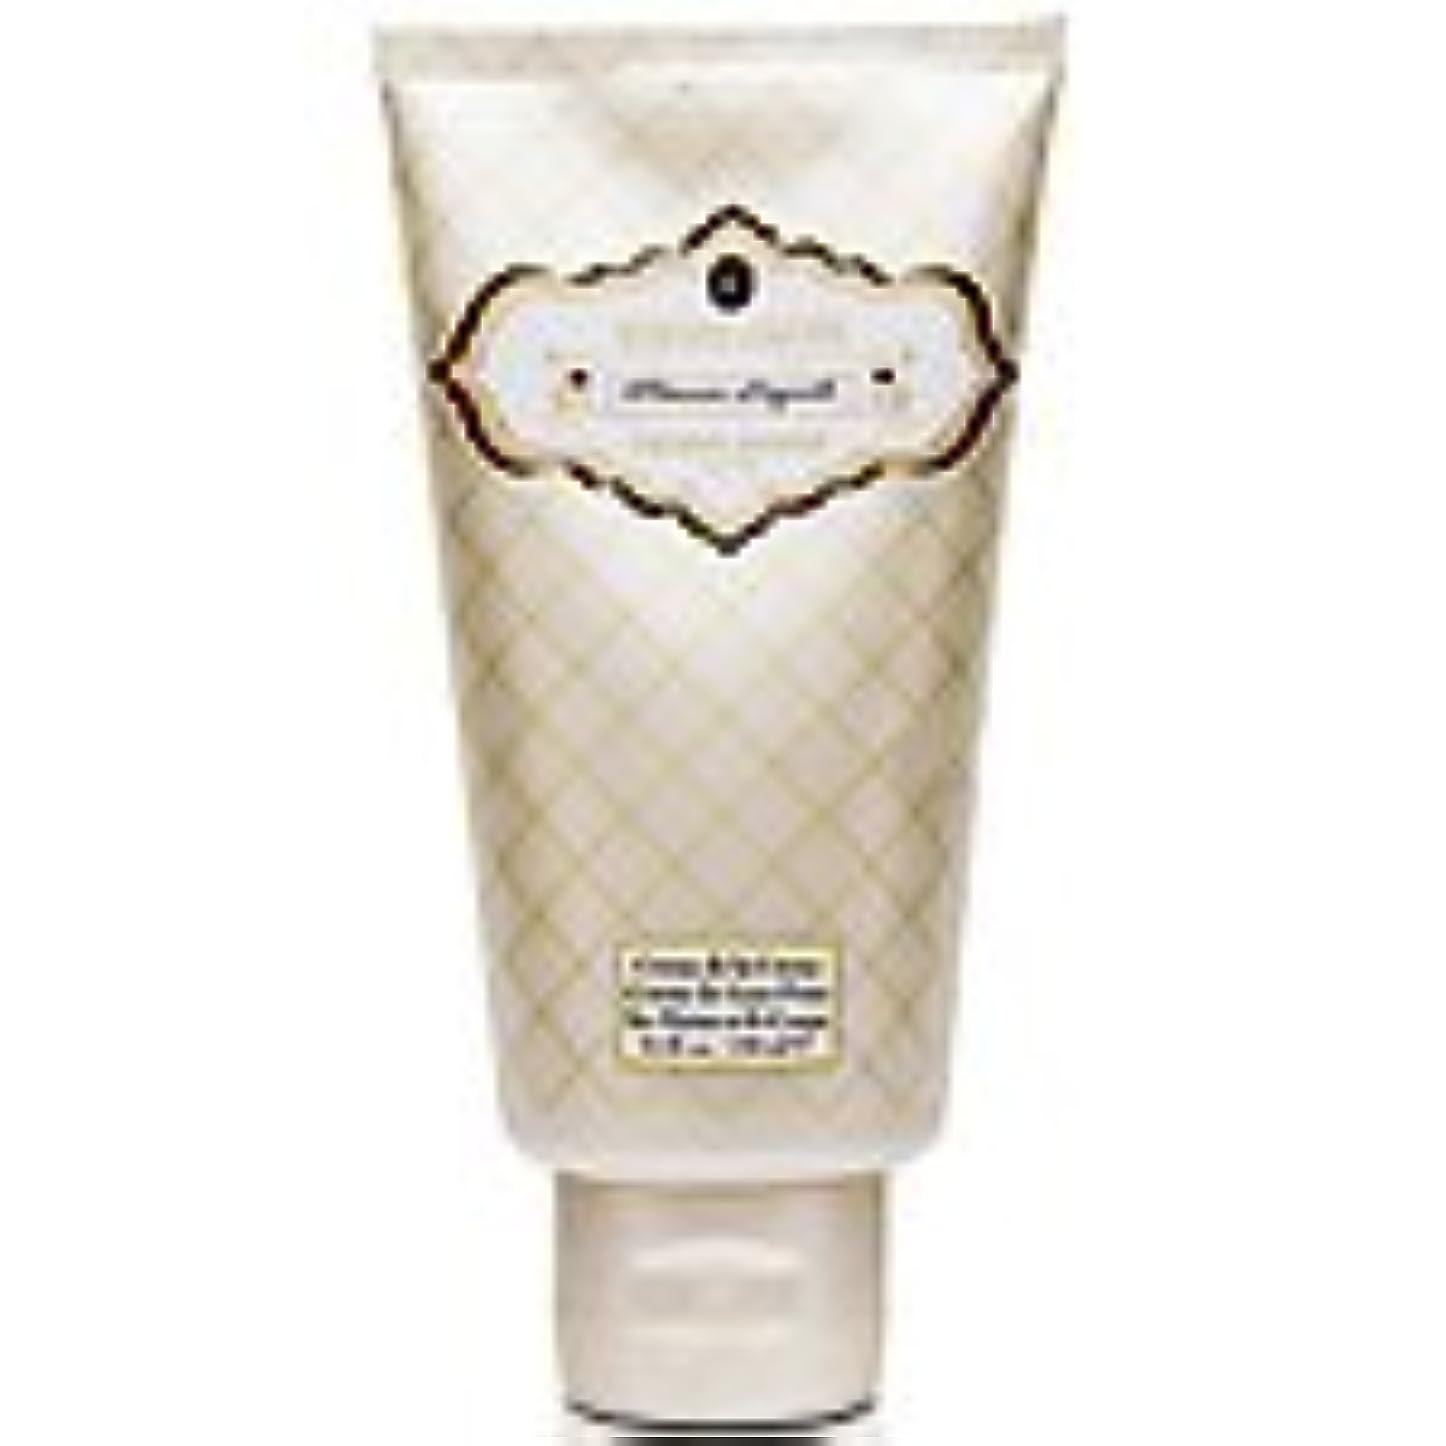 Memoire Liquide Reserve - Encens Liquide (メモワールリキッドリザーブ - エンセンスリキッド) 5.1 oz (153ml) Body Cream for Unisex